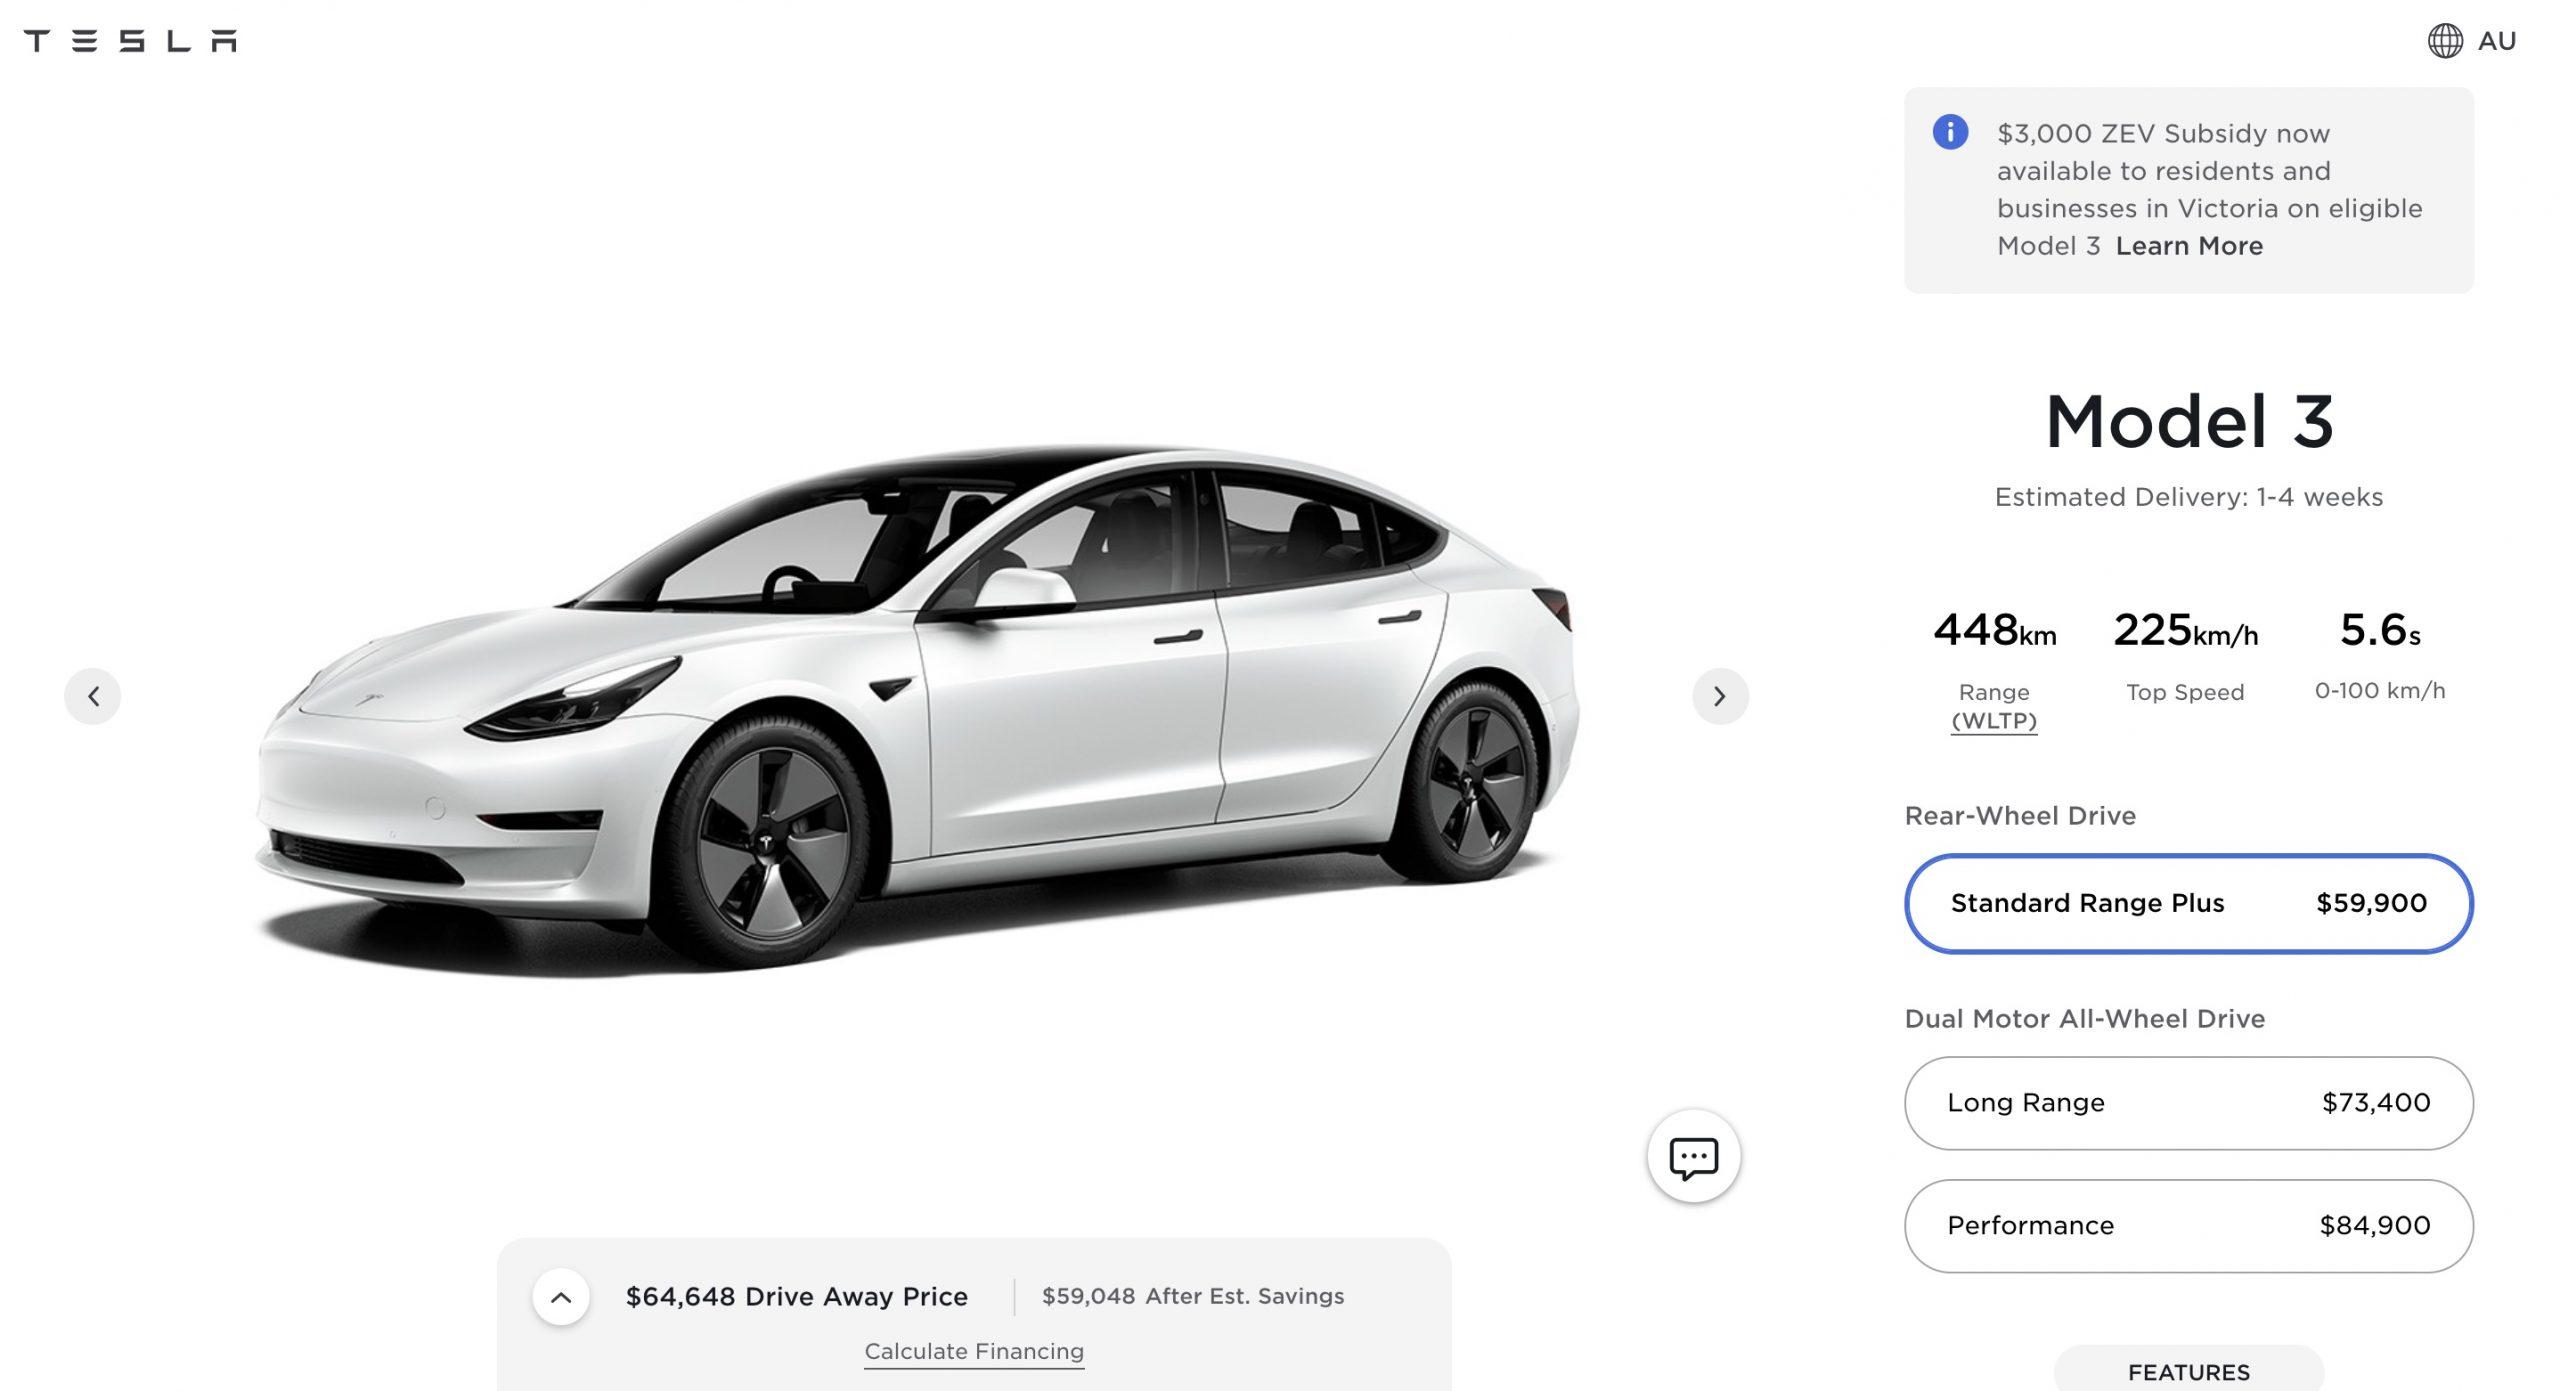 tesla-model-3-australia-price-drop-1-1